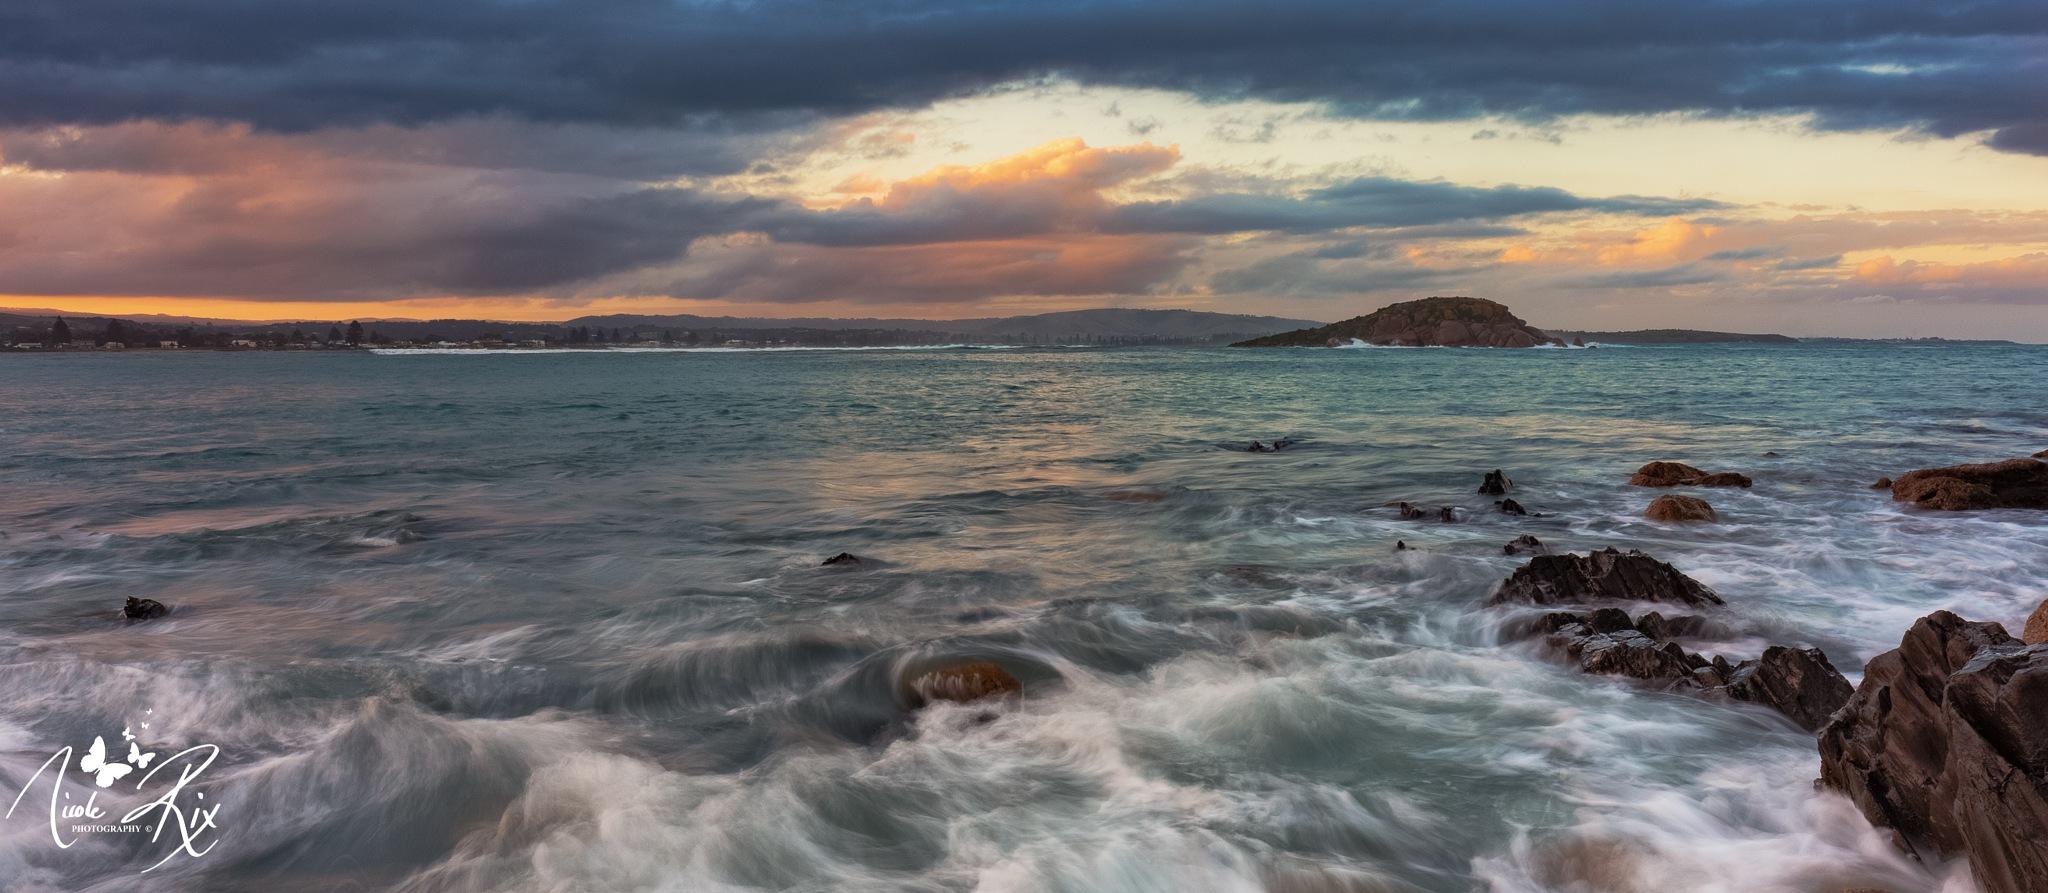 Encounter Bay.. wild waves by Nicole Rix